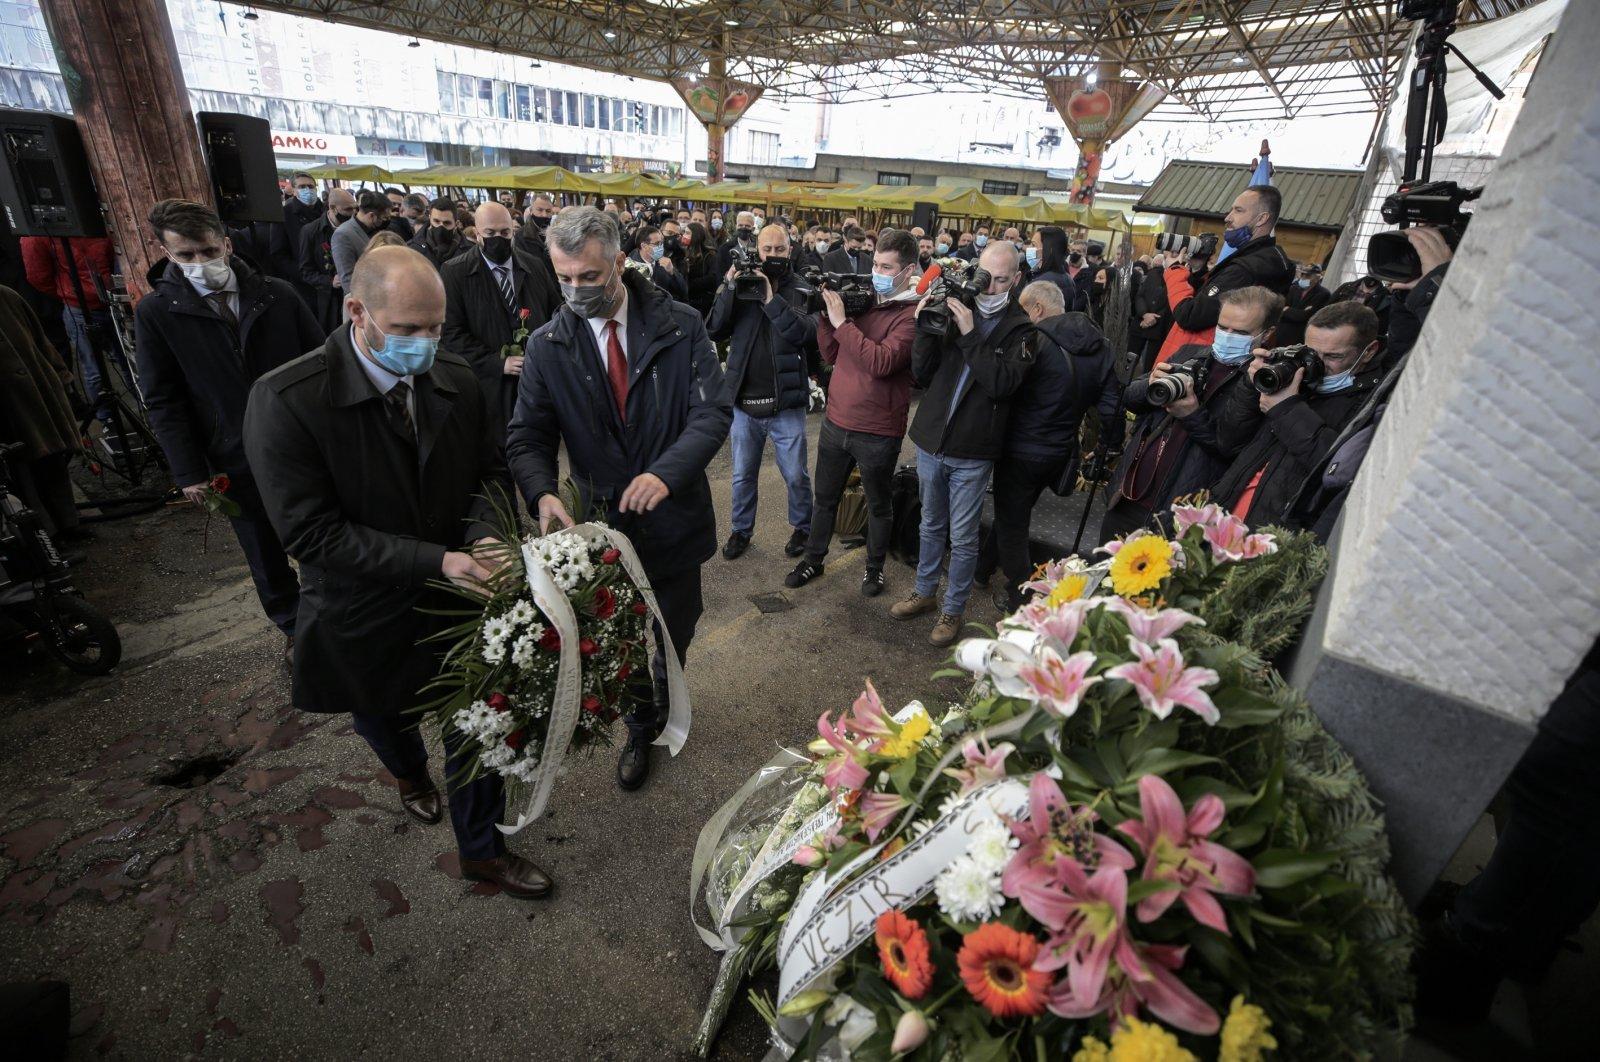 People leave flowers at the monument commemorating the Markale massacres in Sarajevo, Bosnia and Herzegovina, Feb. 5, 2021 (AA Photo)